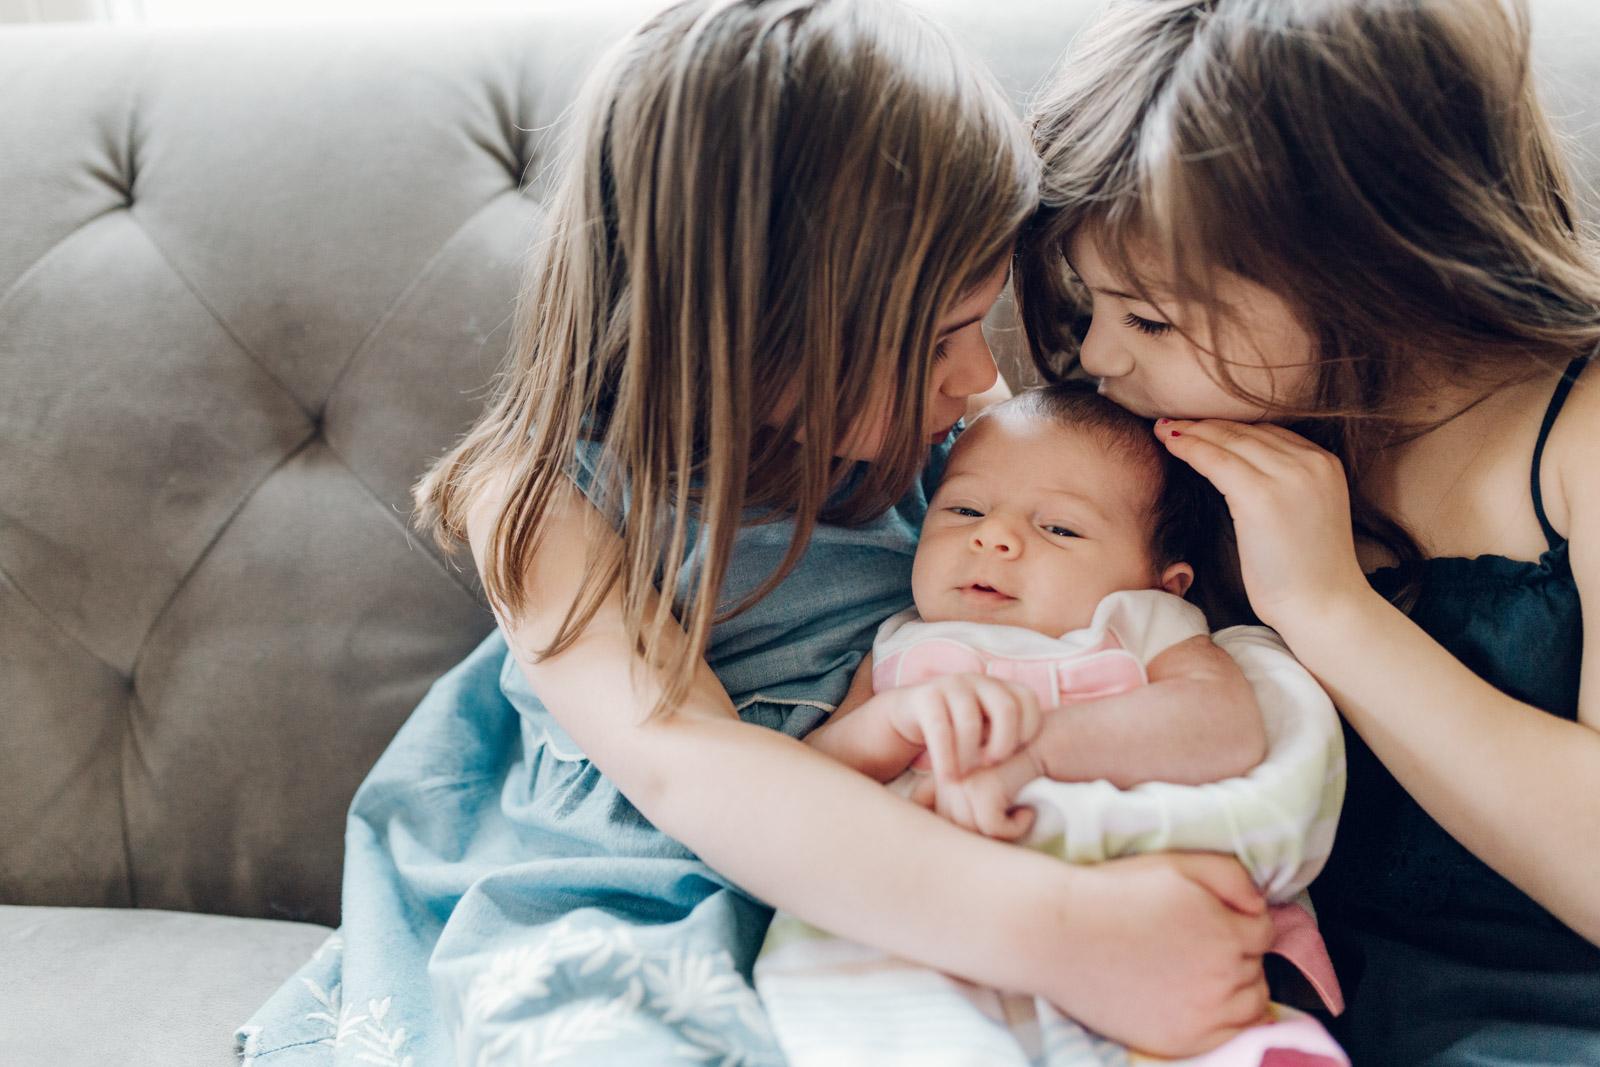 lifestyle-newborn-photography-session-laura-barr-14.jpg